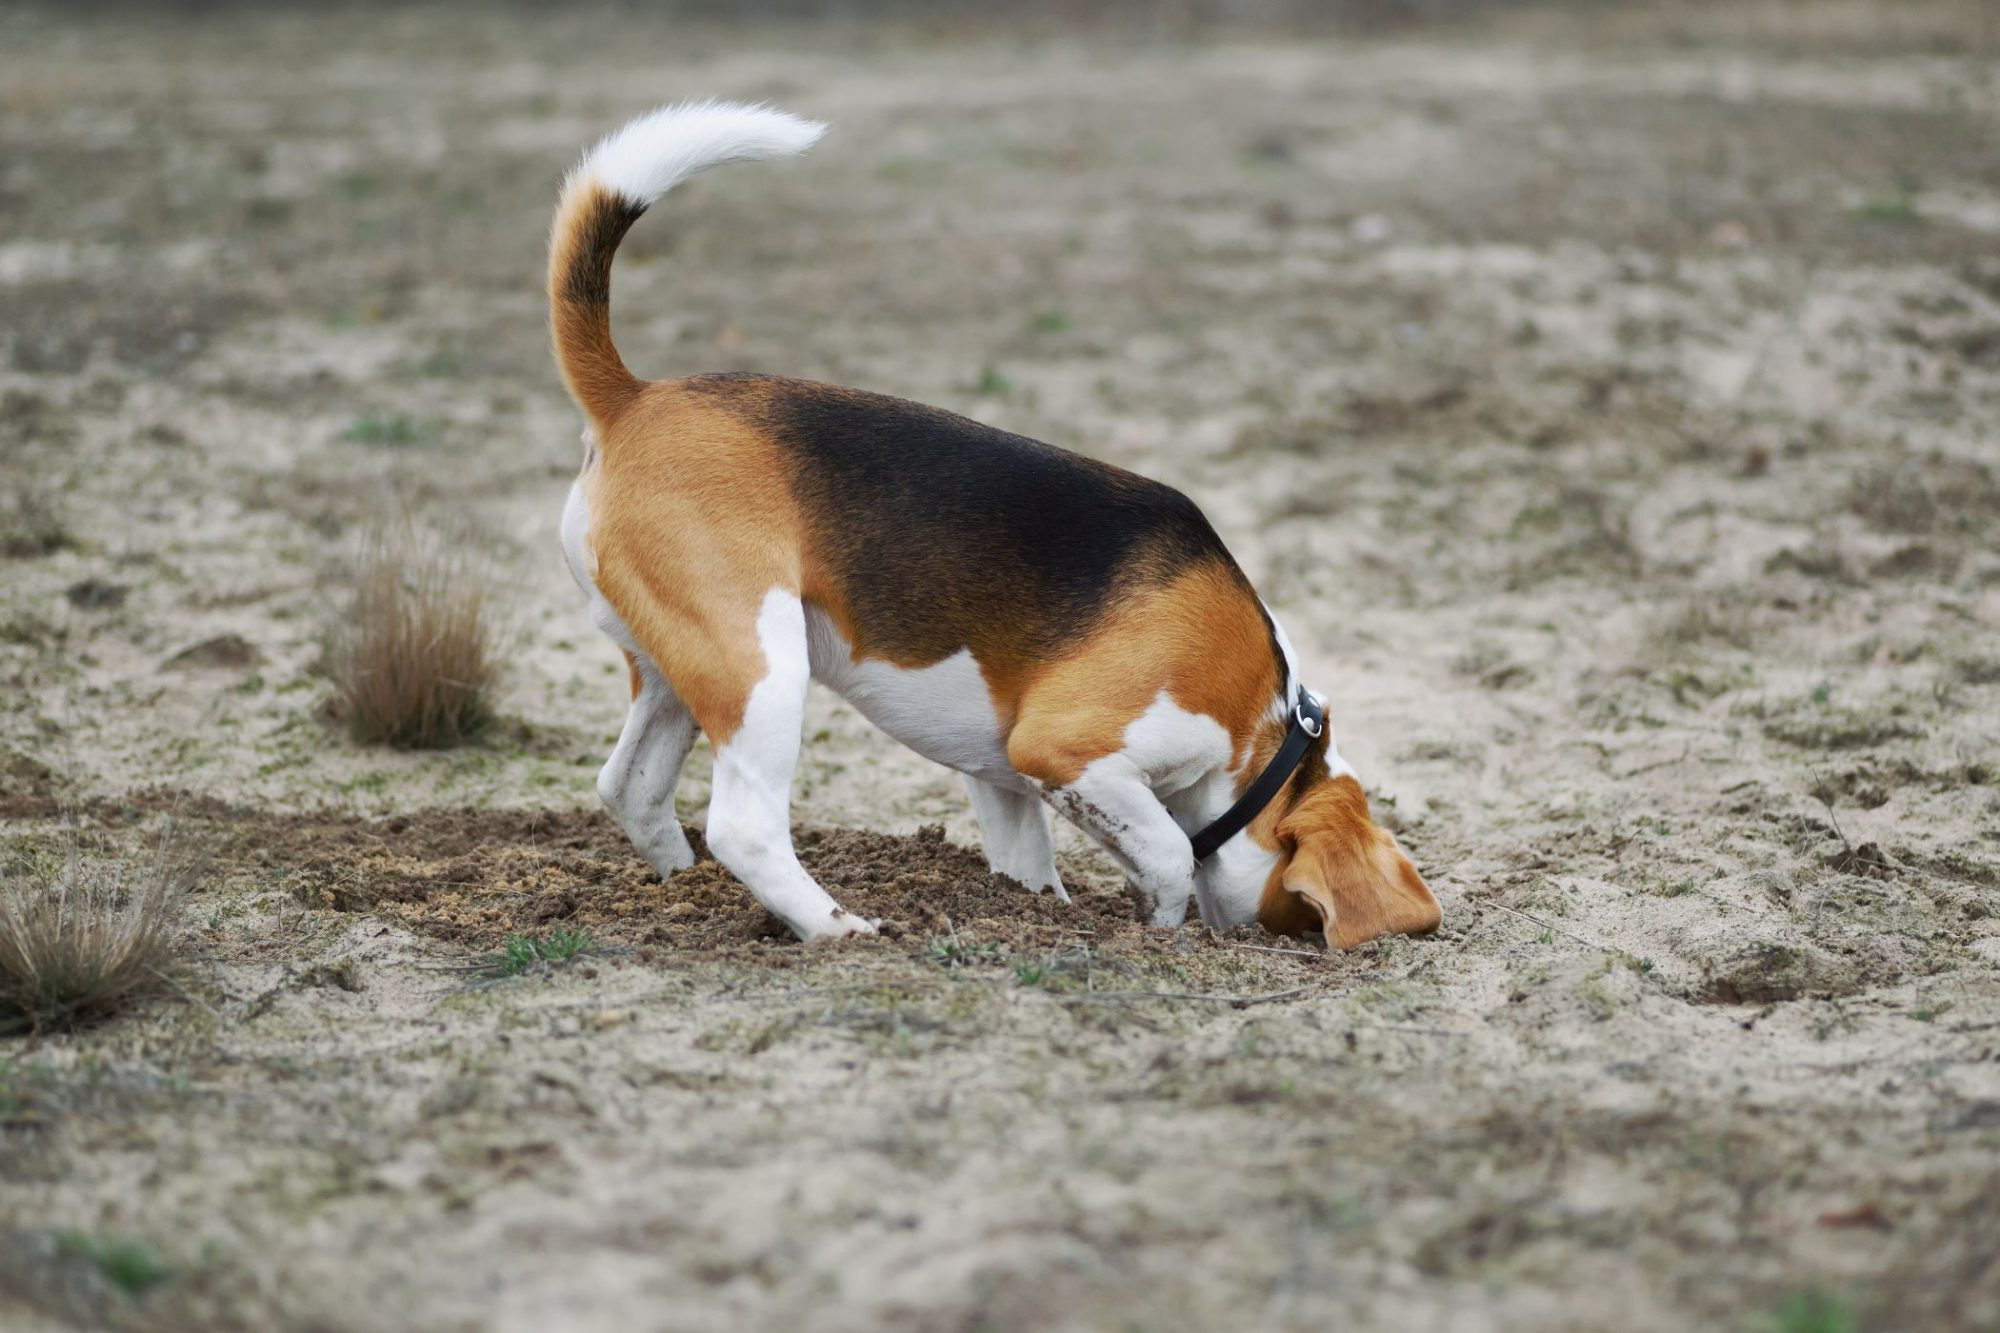 Dog burying and digging in backyard.